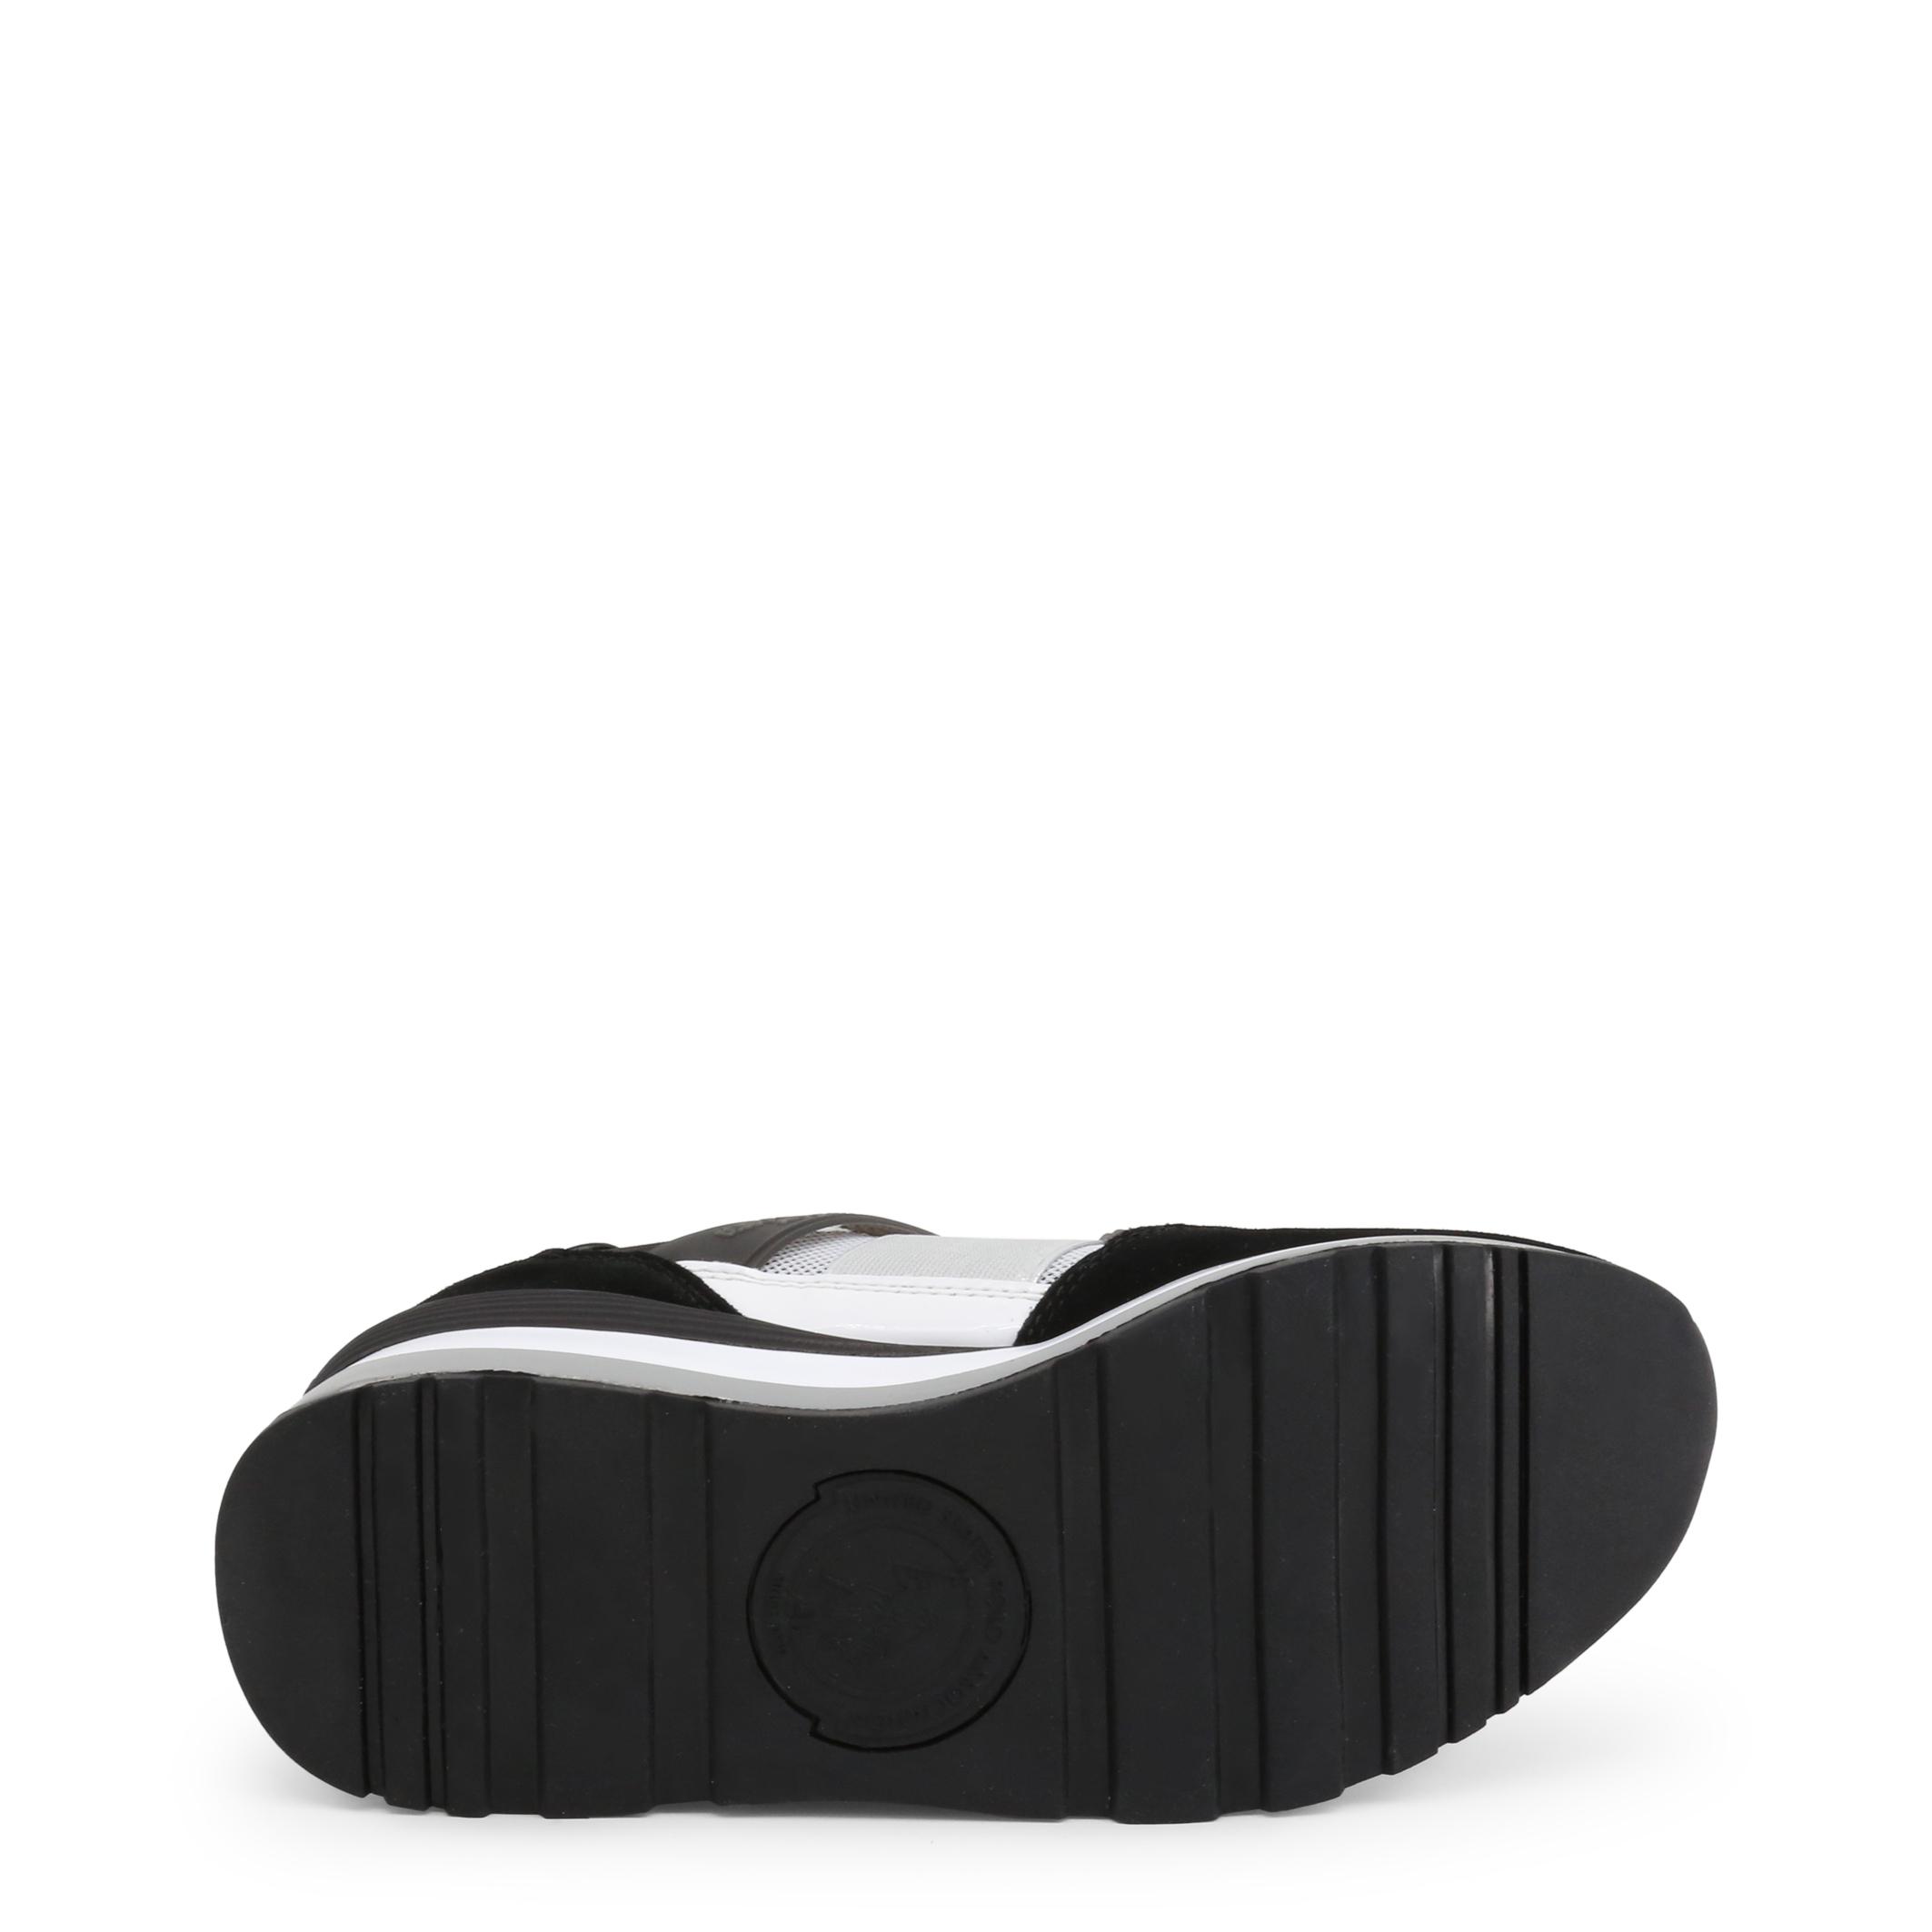 Baskets / Sneakers  U.S. Polo Assn. YLA4090W9_TS2_BLK black